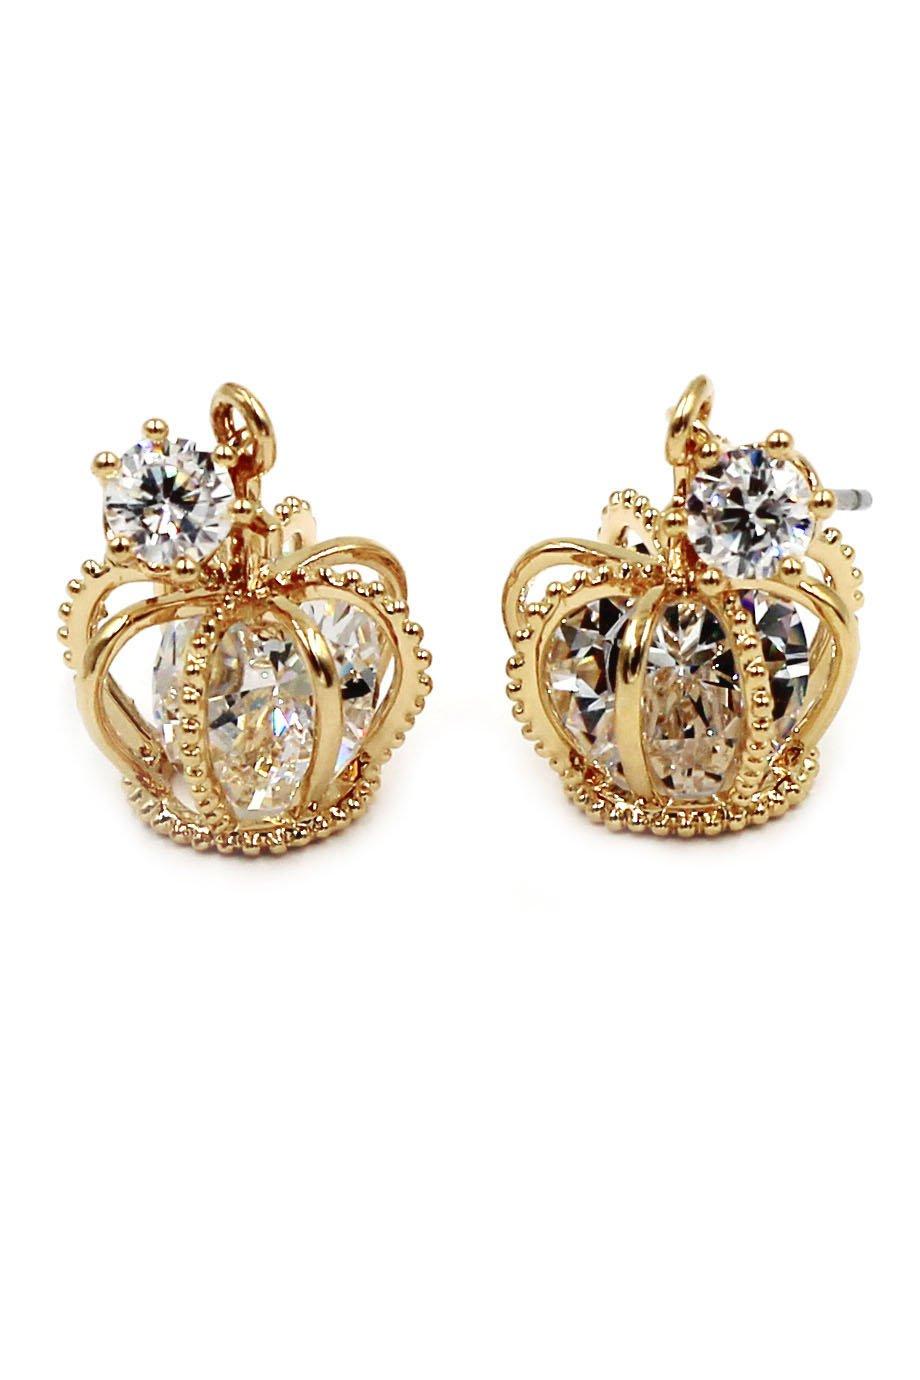 Fashion mini crown crystal gold earrings